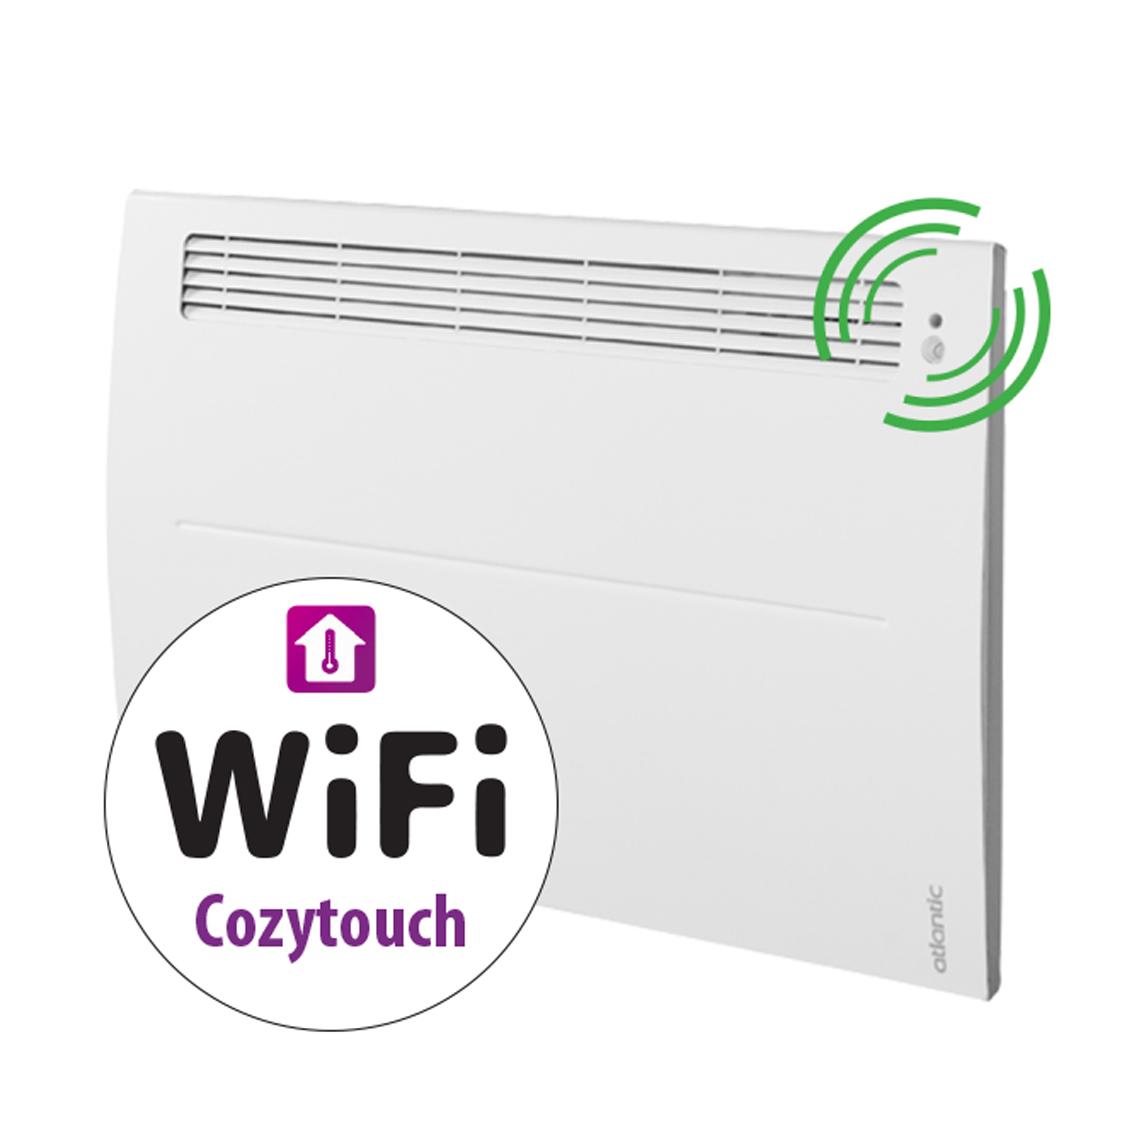 Konvektor Altis Ecoboost + WiFi 1500W Atlantik Elektro Vukojevic